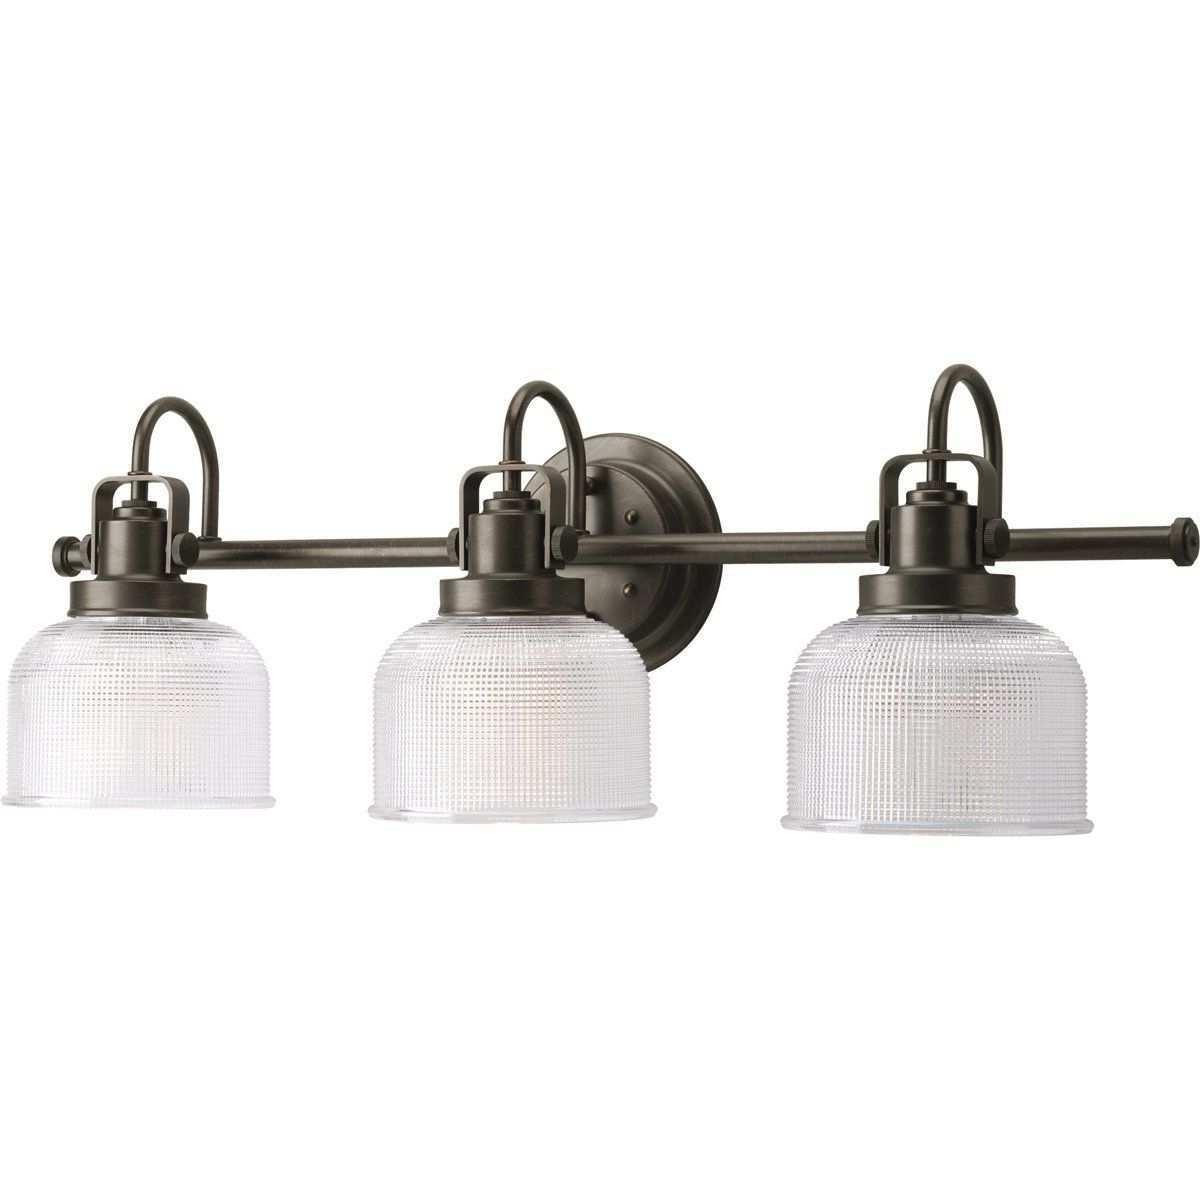 Wayfair Bathroom Vanity Lights Fresh Bathroom Ideas Led Bathroom In Trendy Wayfair Led Post Lights (View 14 of 20)